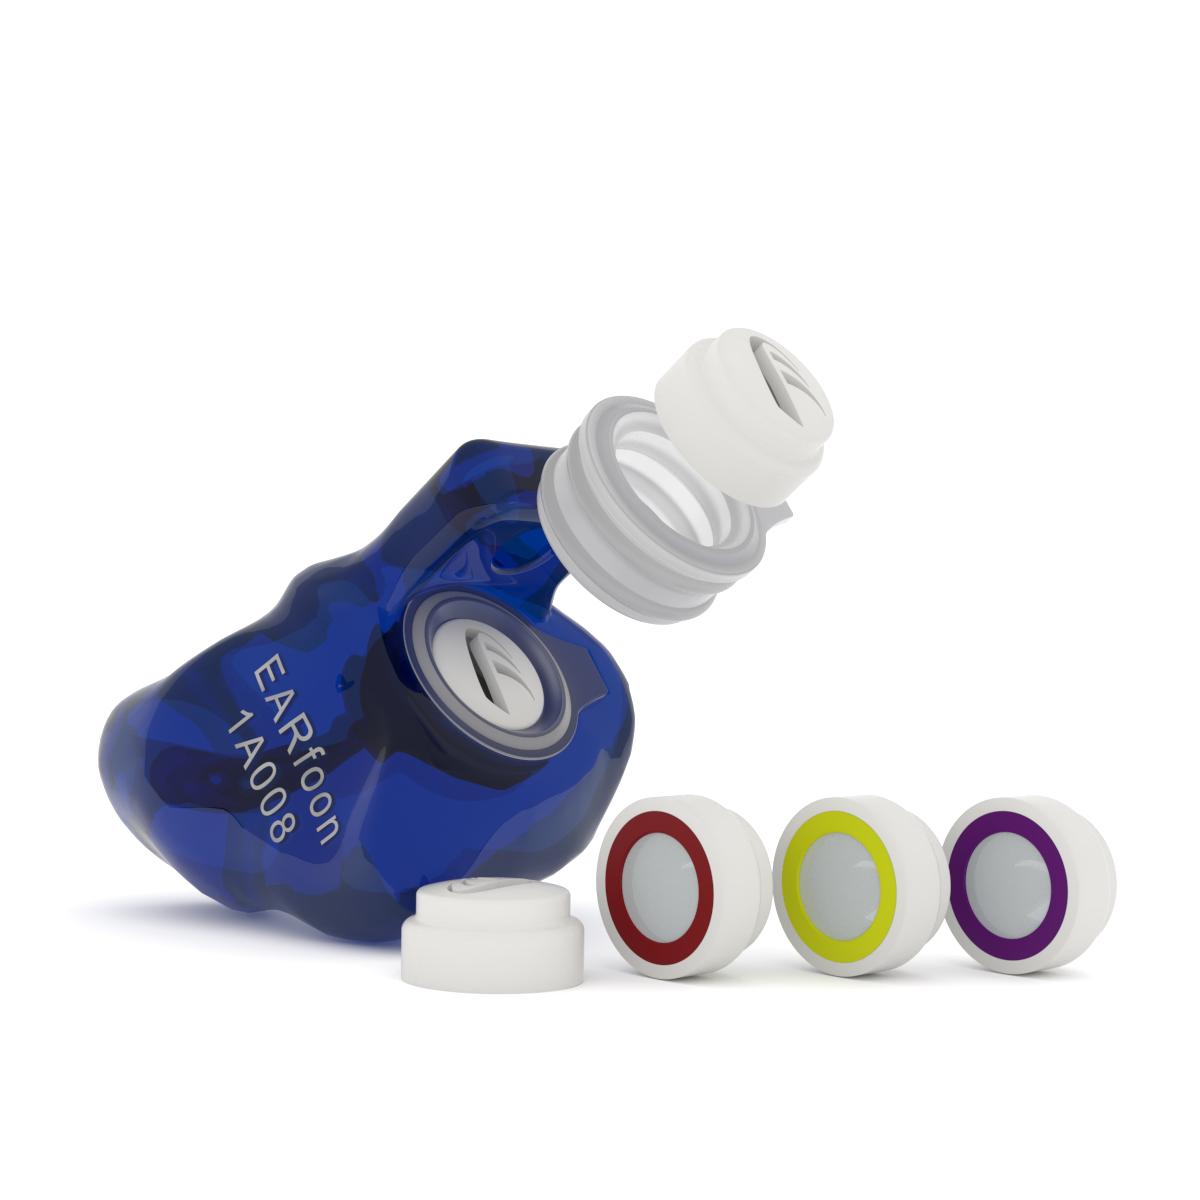 Angepasster Gehörschutz | BlueFit-X mit Wechselfiltern